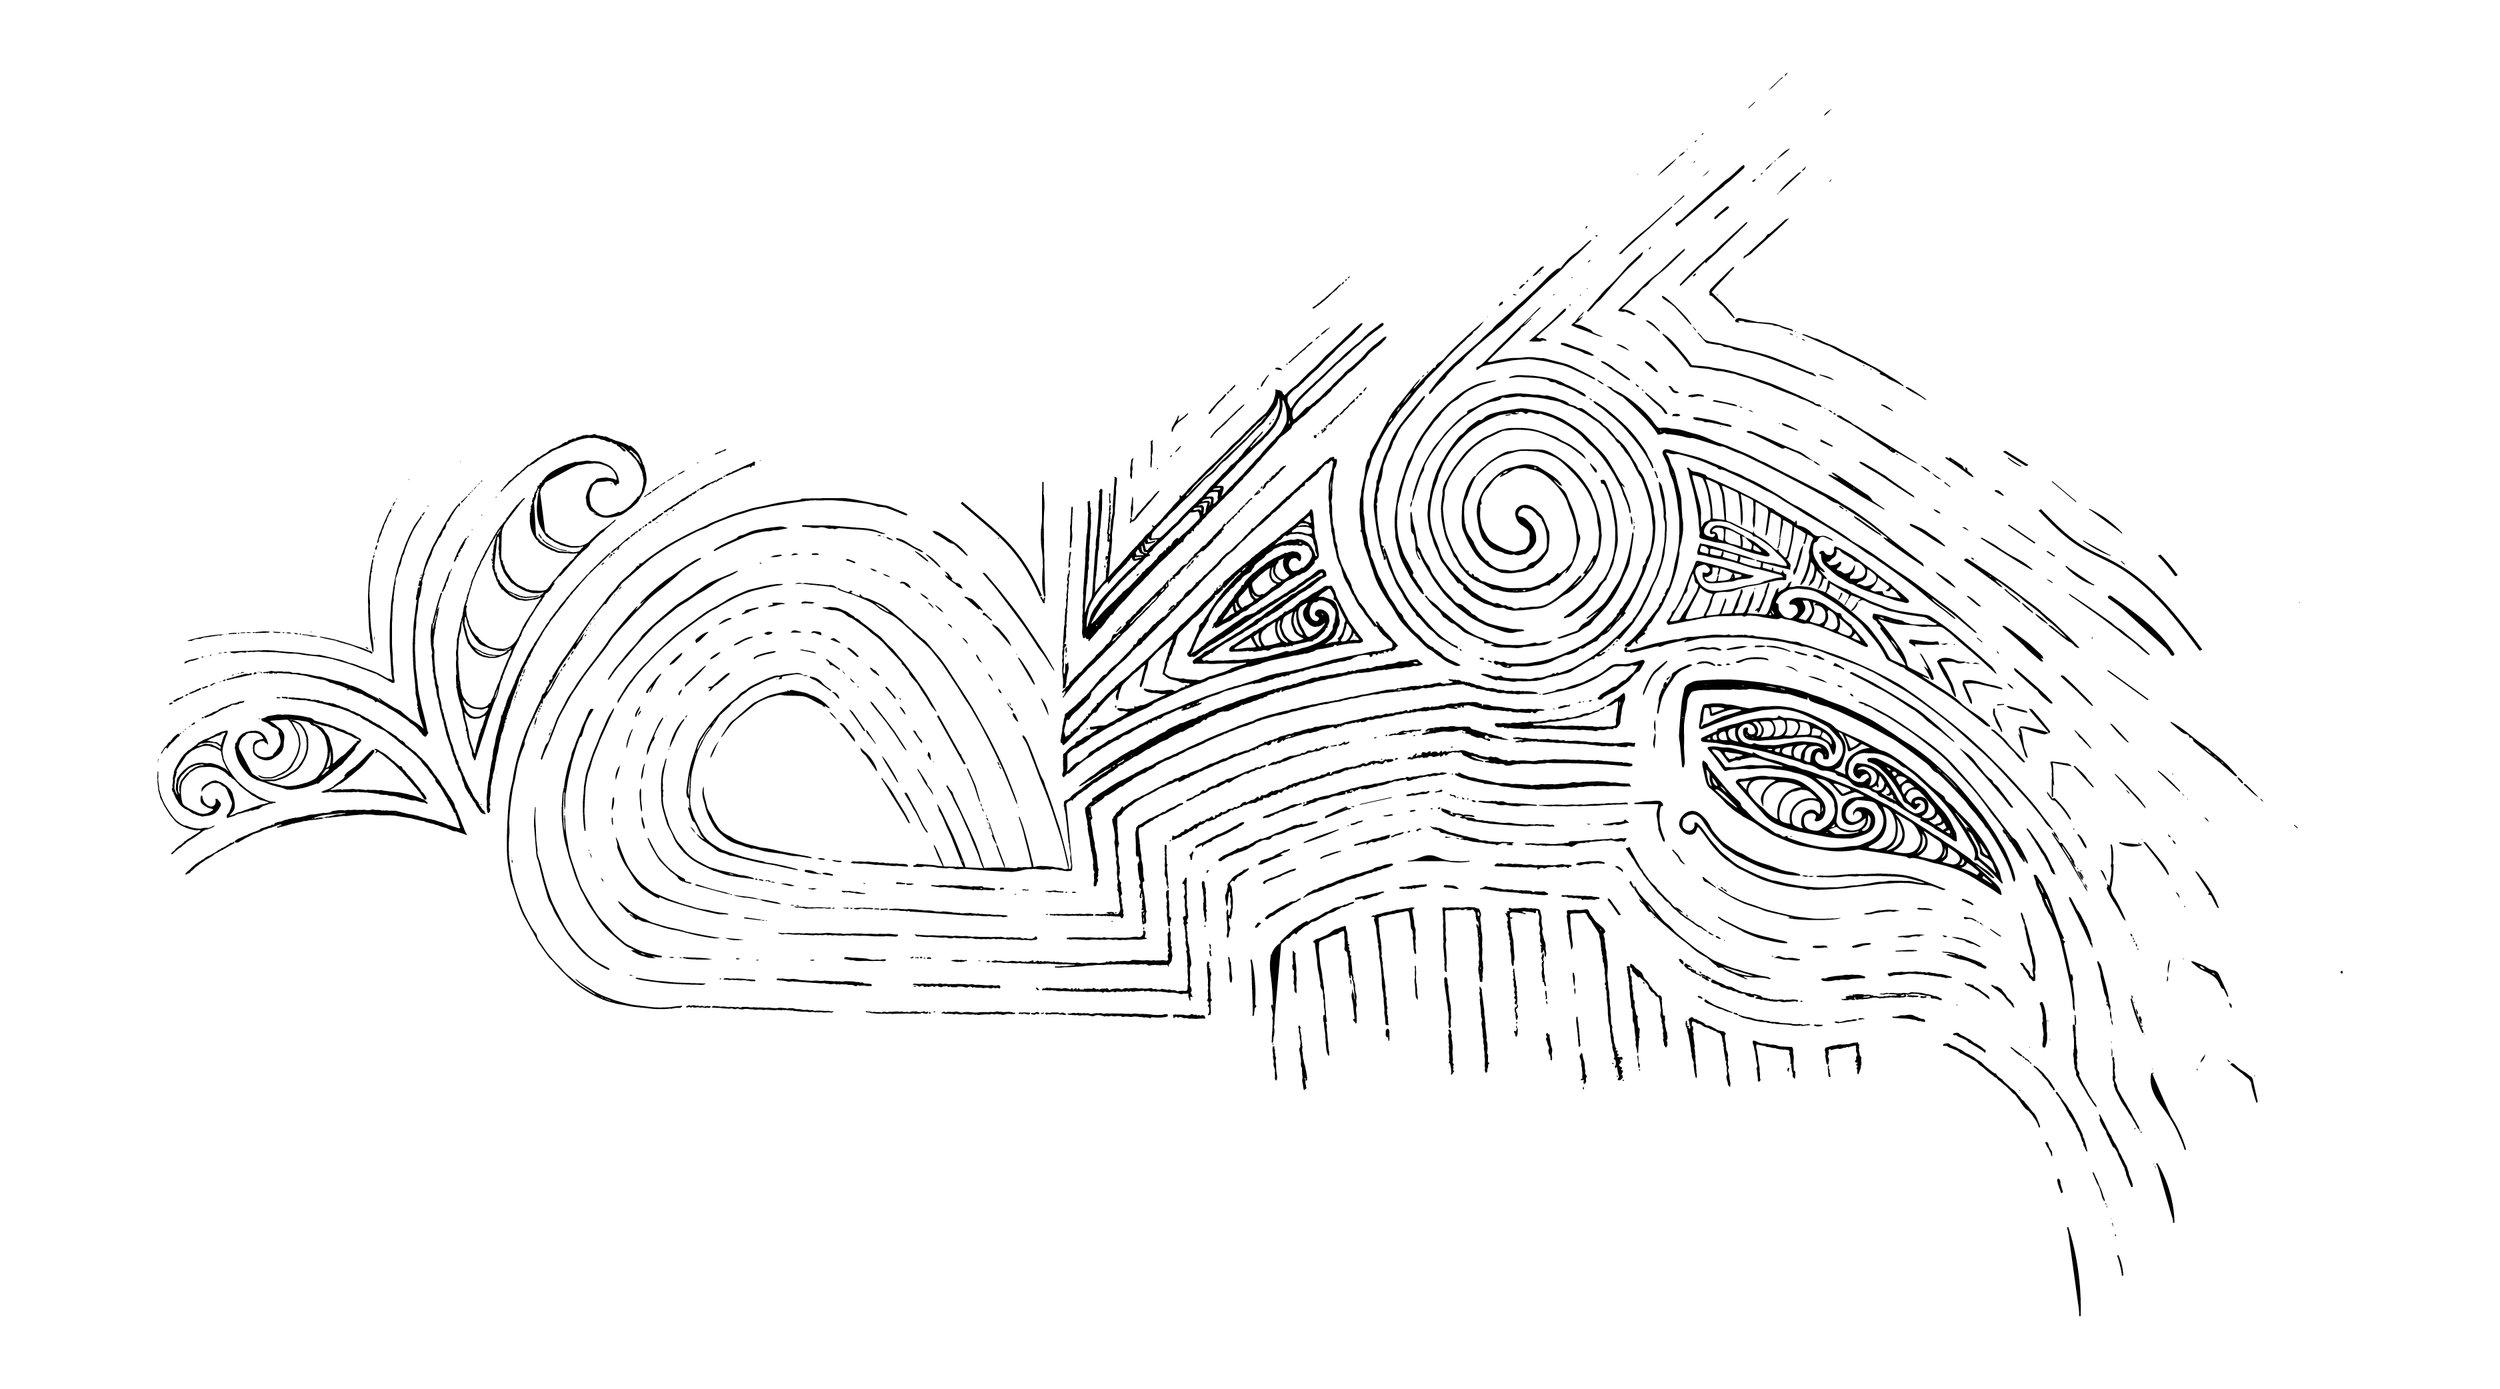 RBNZ_MaoriMotif_webportfolio_14.jpg